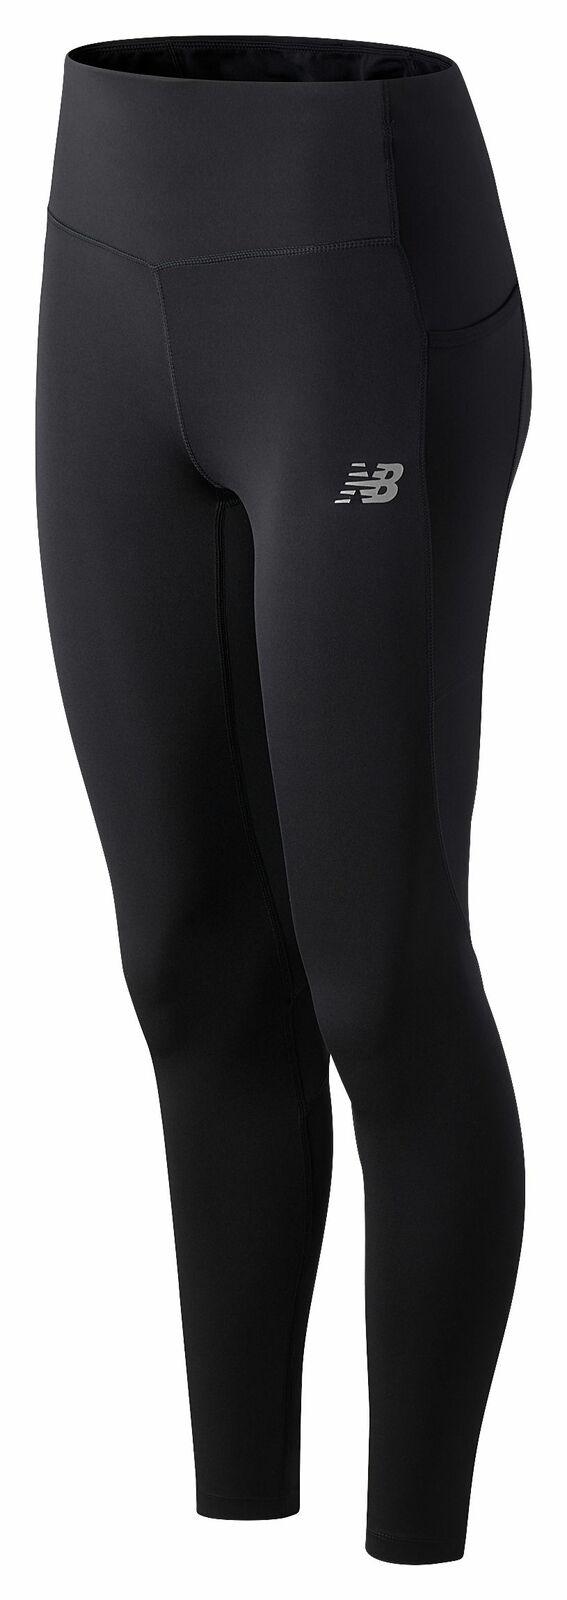 New Balance Women's Impact Run Tight Black Size XS